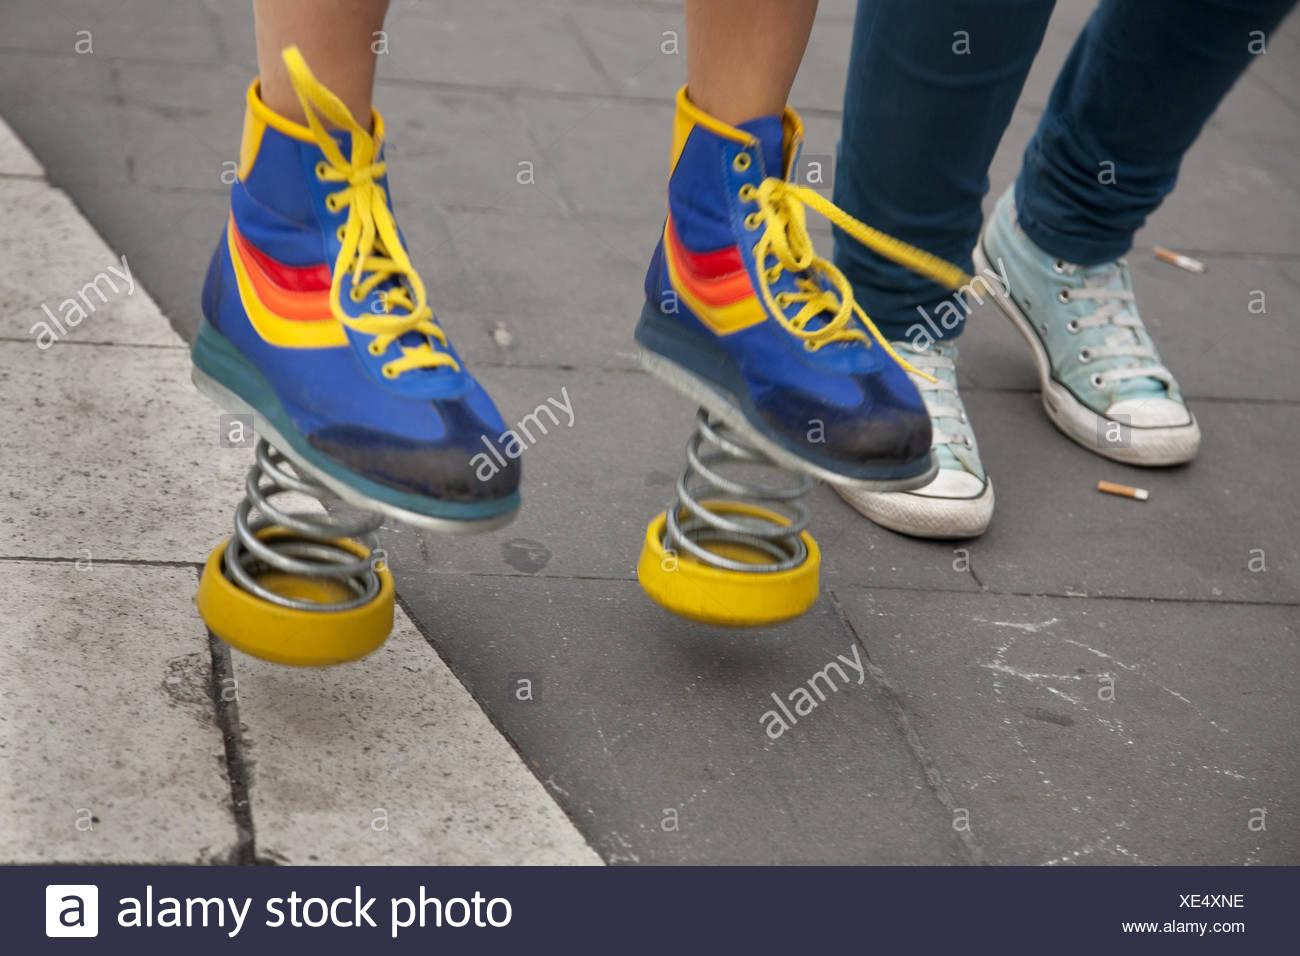 Schuhe, Stockholm zu springen Stockfoto, Bild: 284079866 Alamy